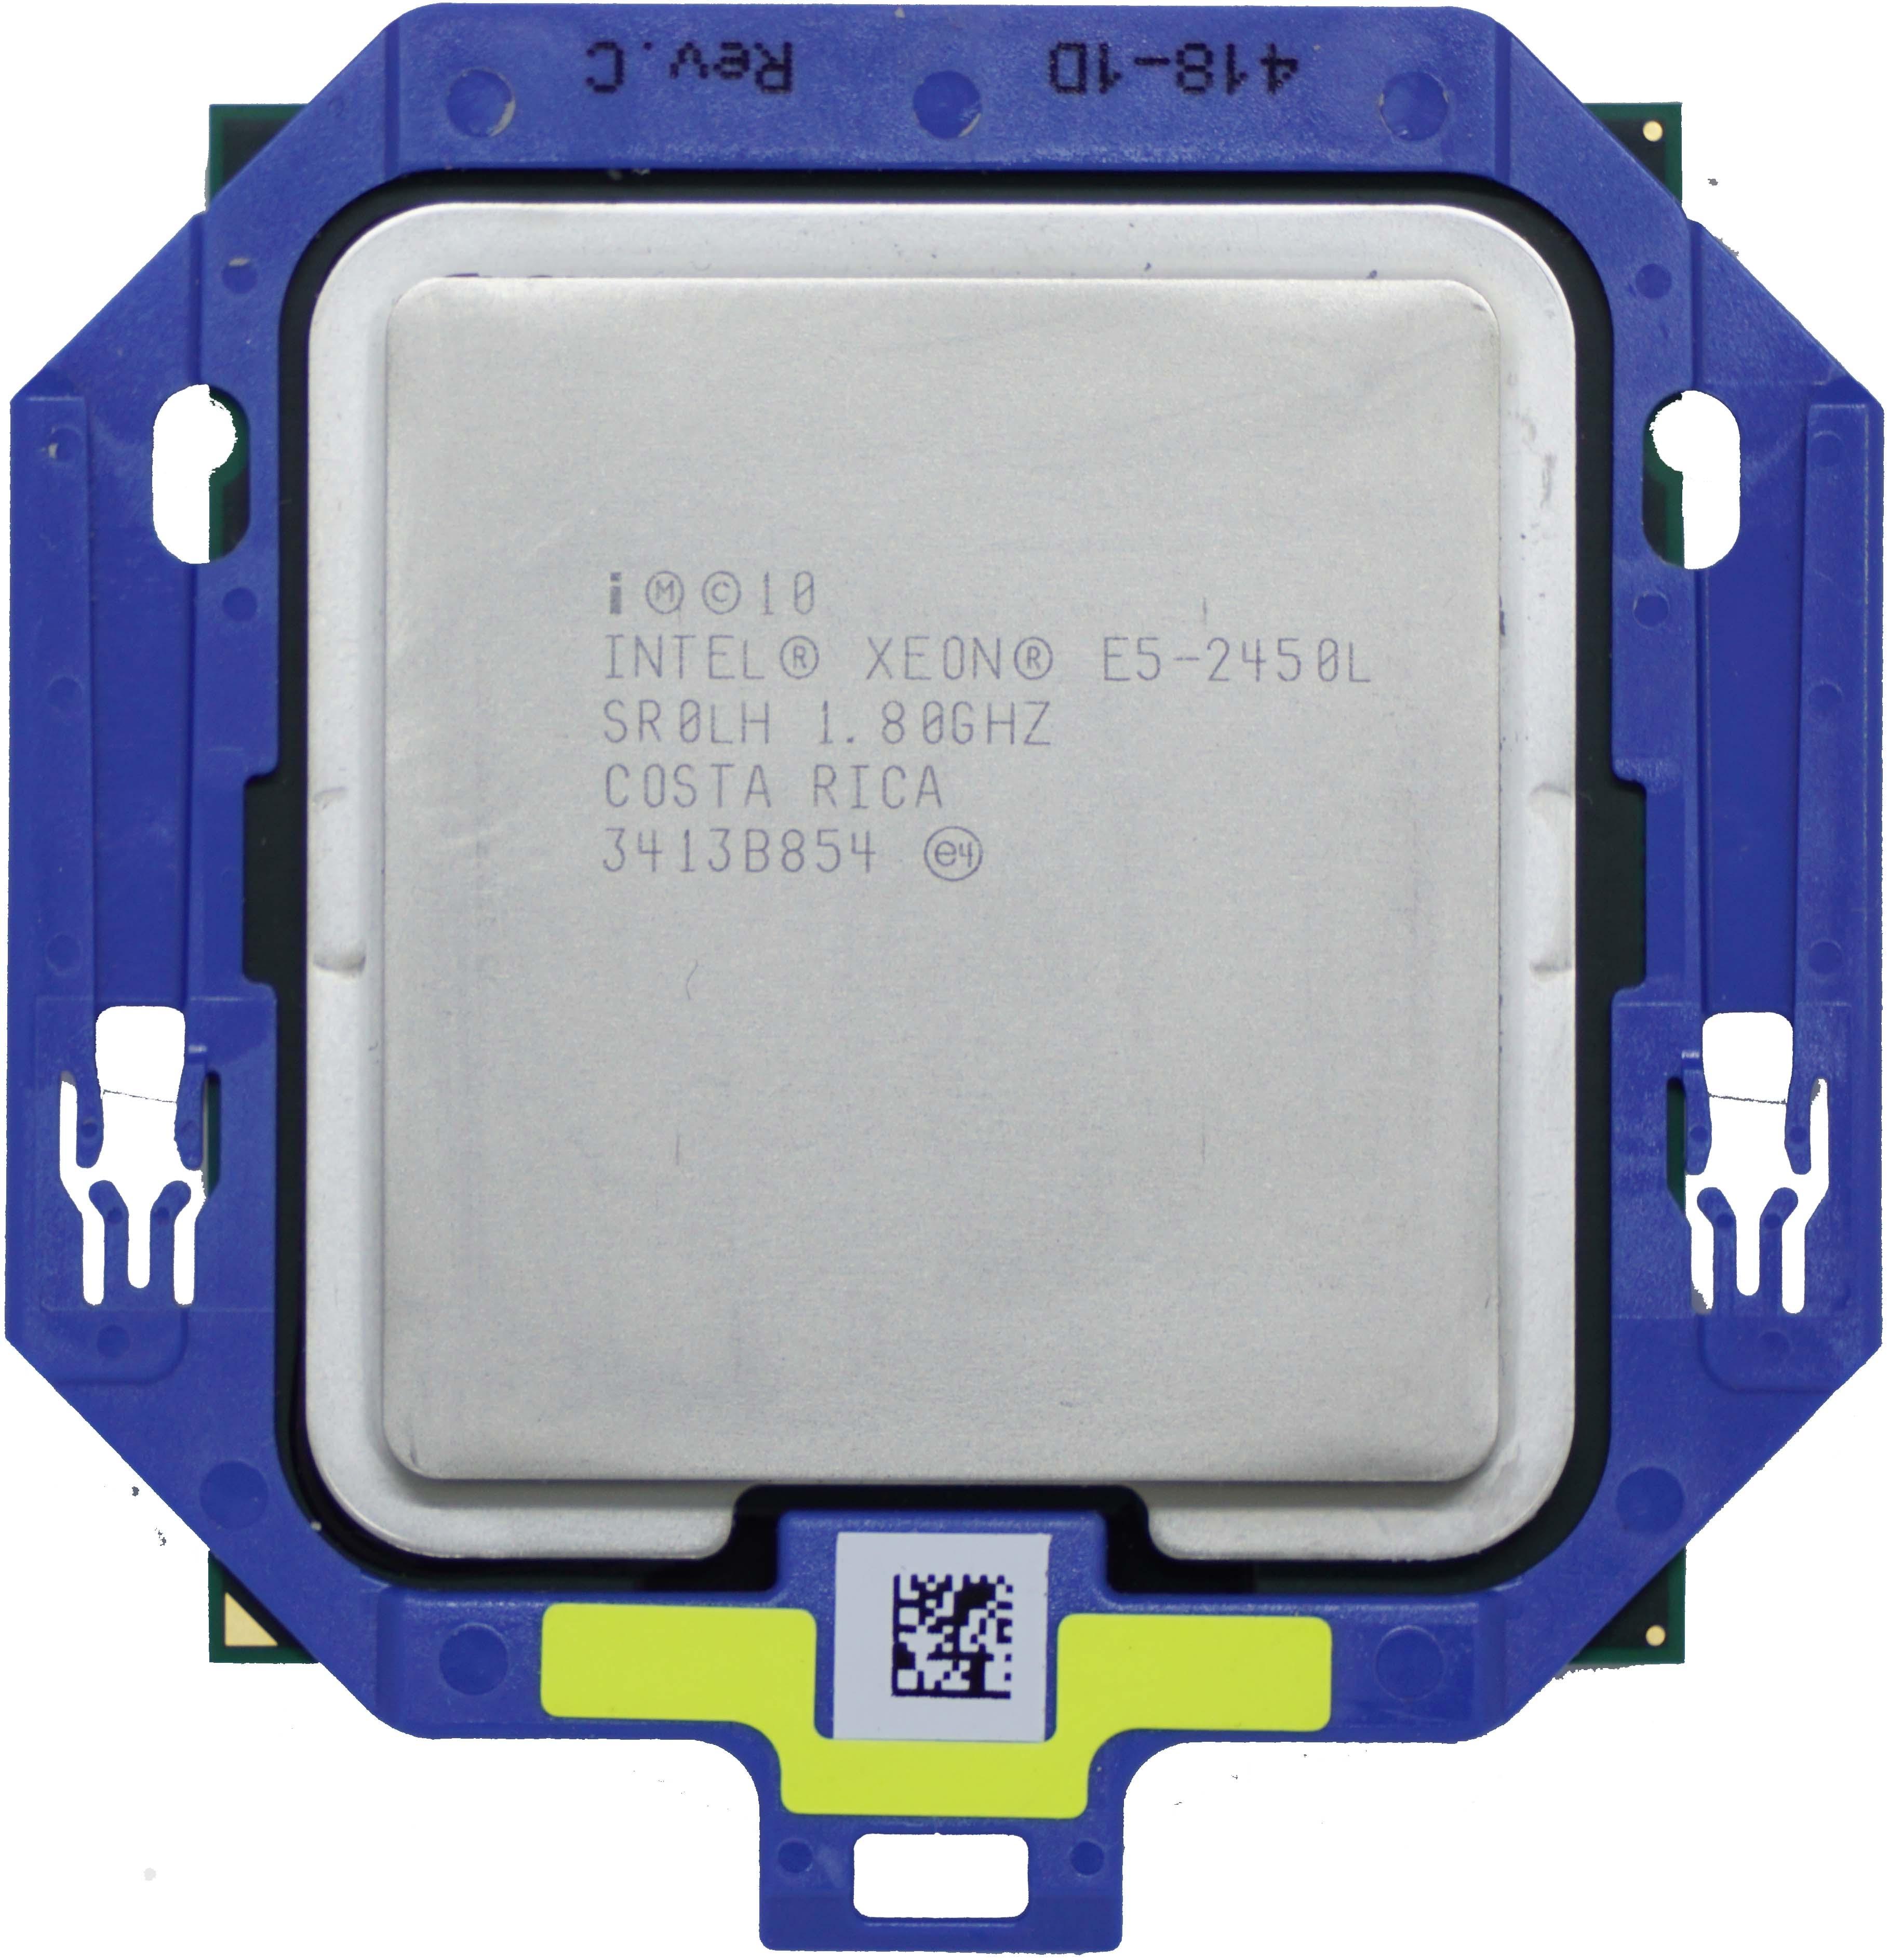 Intel Xeon E5-2450L E5 2450L 1.8 GHz Eight-Core Sixteen-Thread CPU Processor 20M 70W LGA 1356